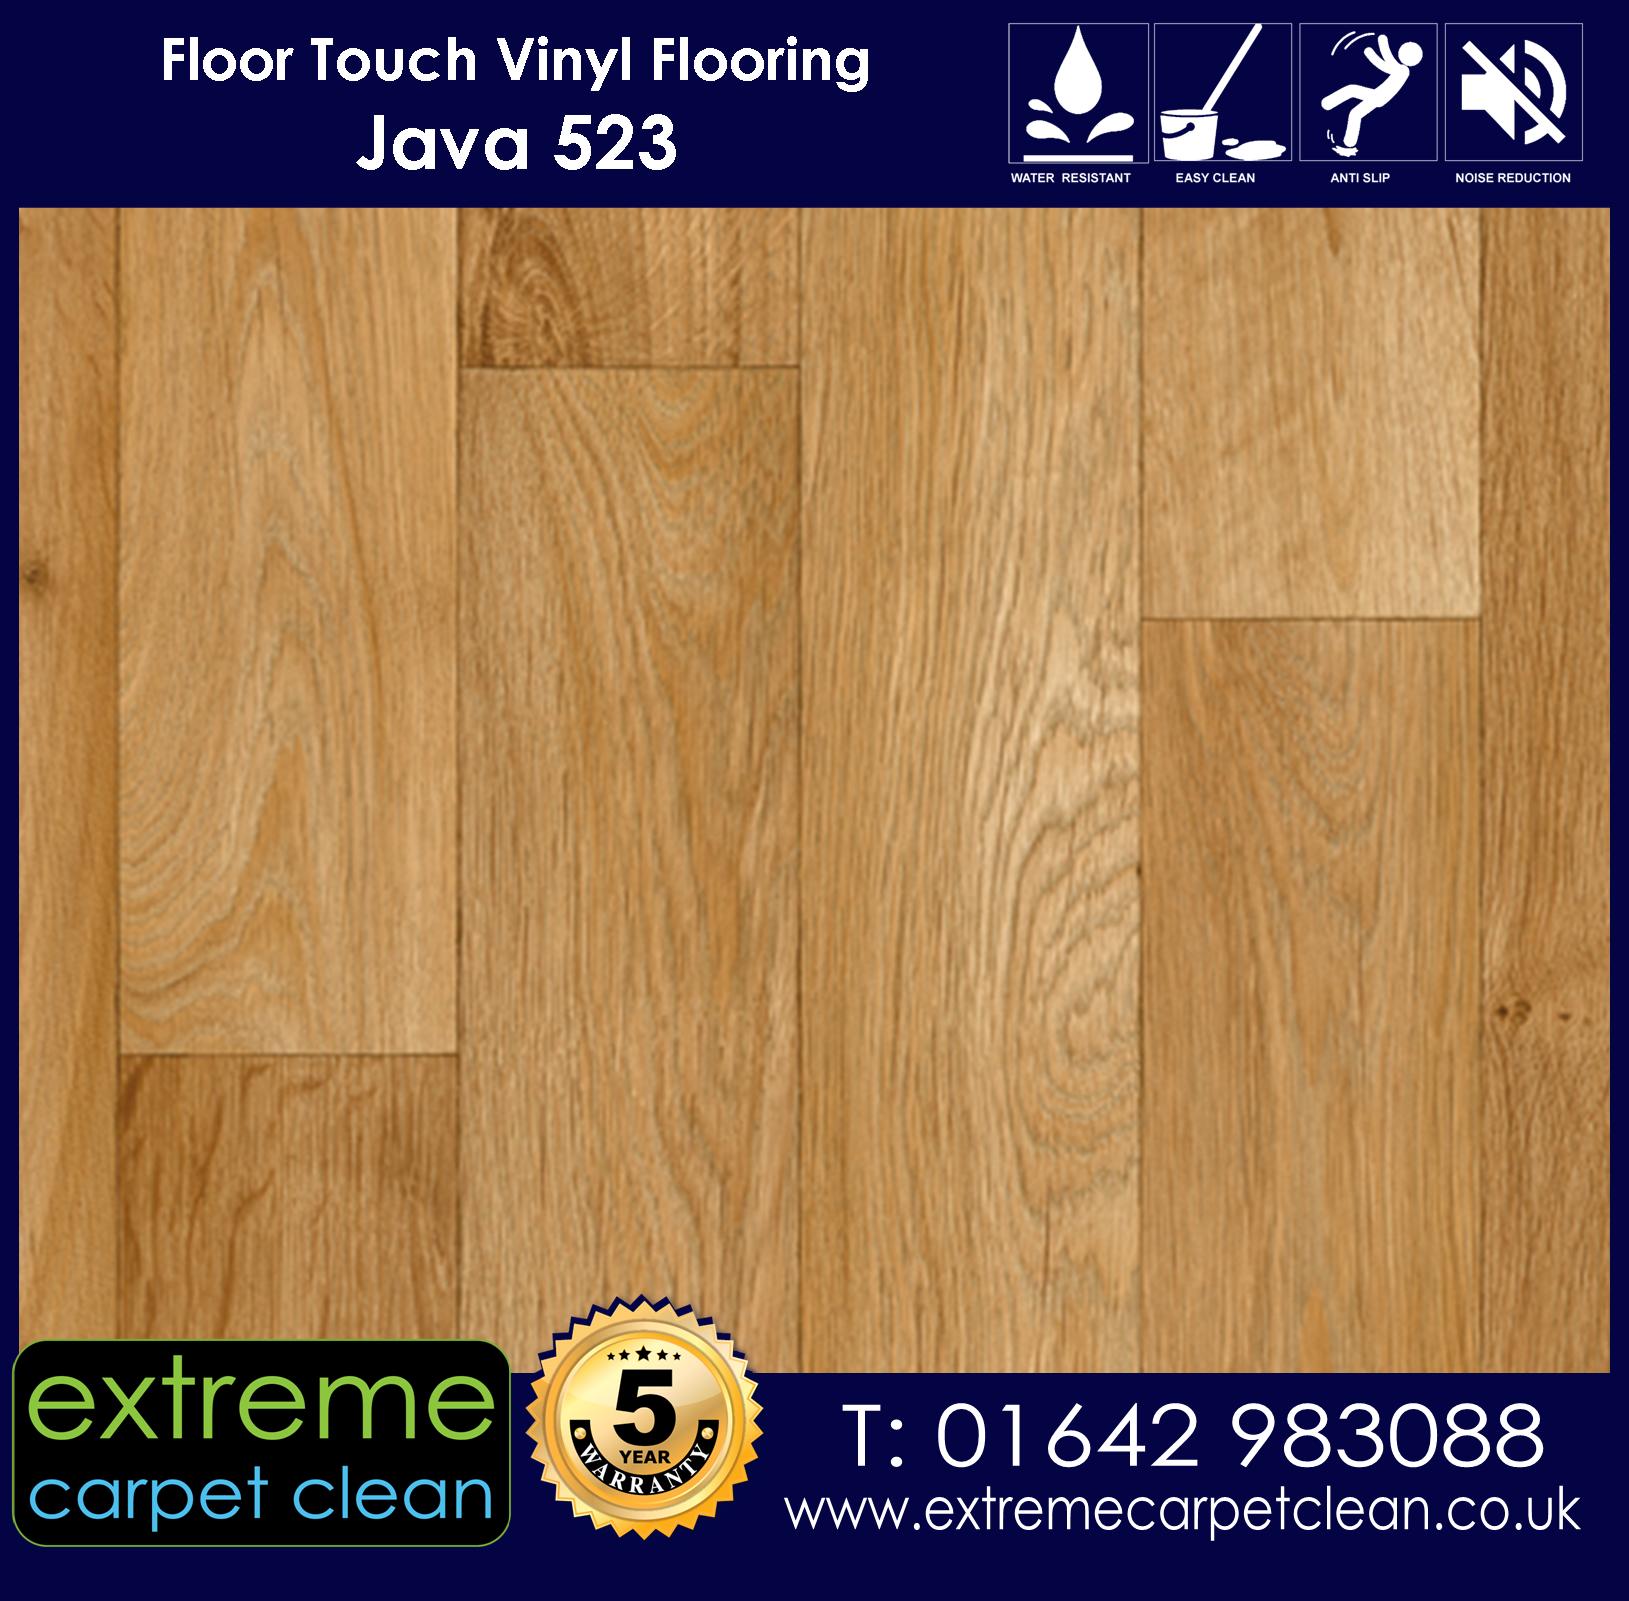 Extreme Carpet Clean. Vinyl Flooring. Java